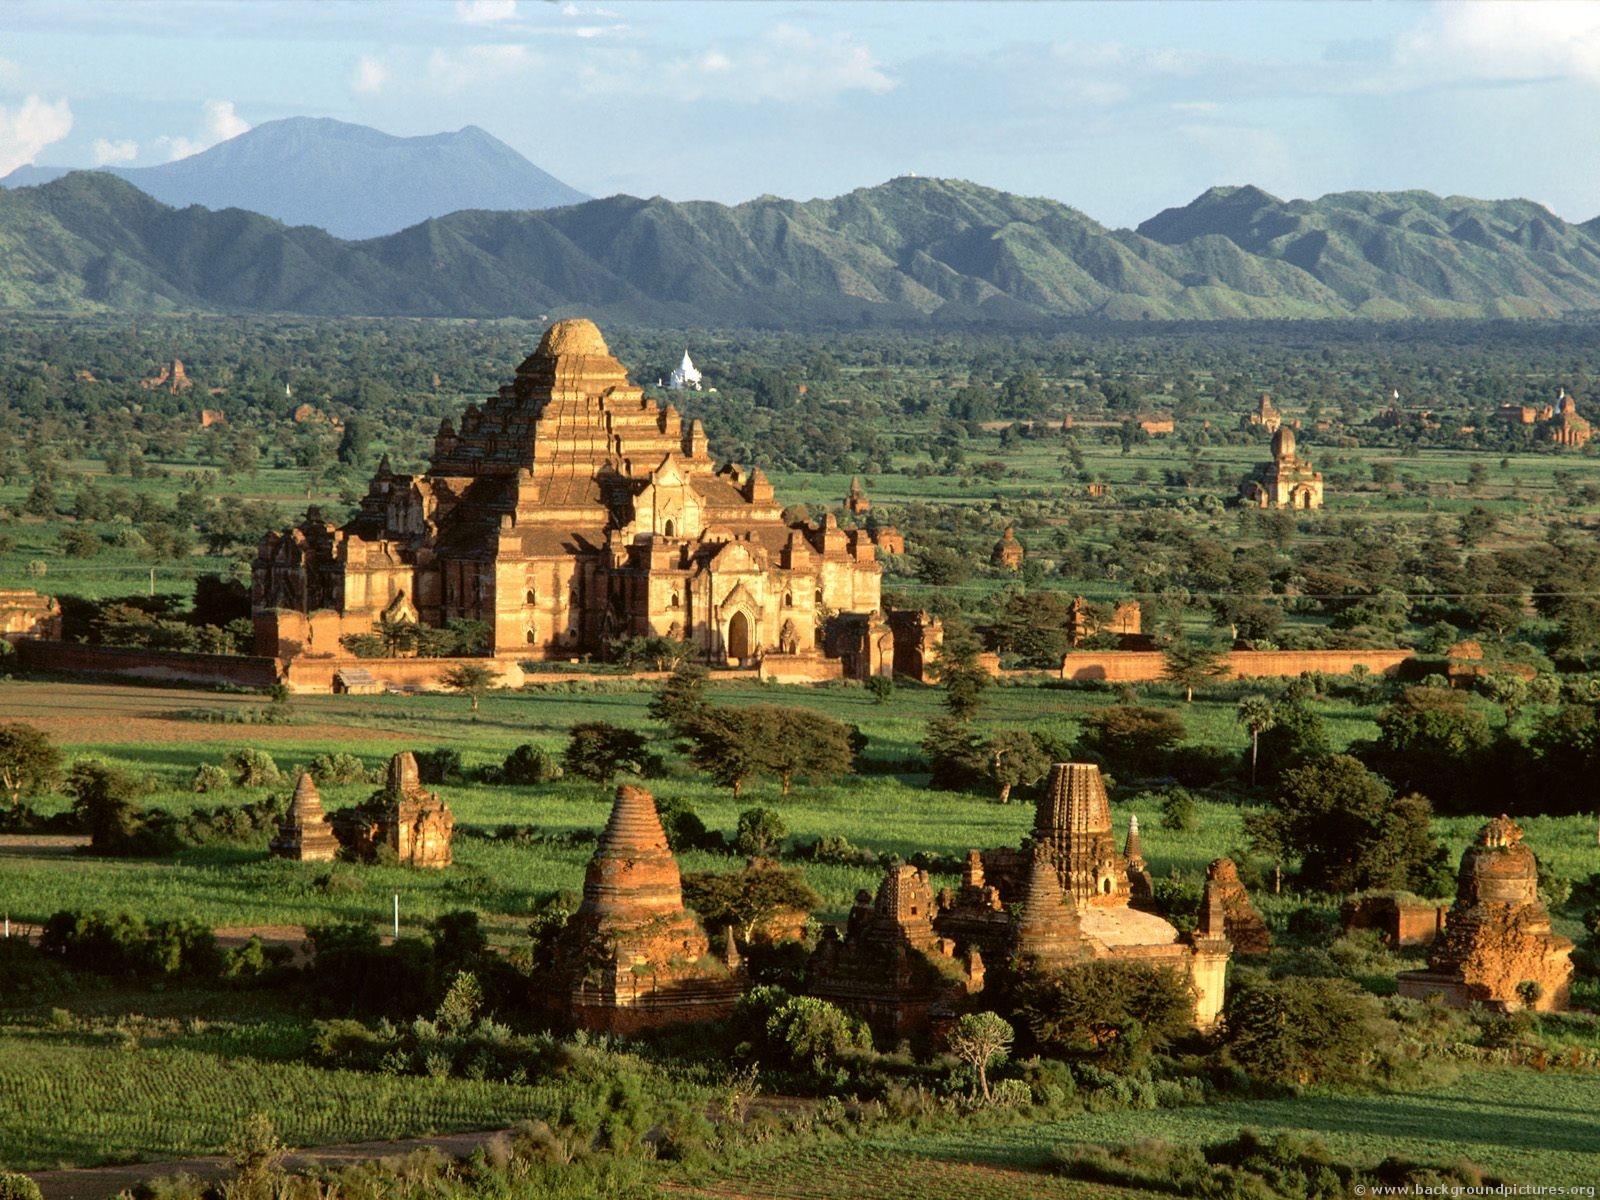 Amazing Vietnam, Cambodia, Thailand and Myanmar 25 Days